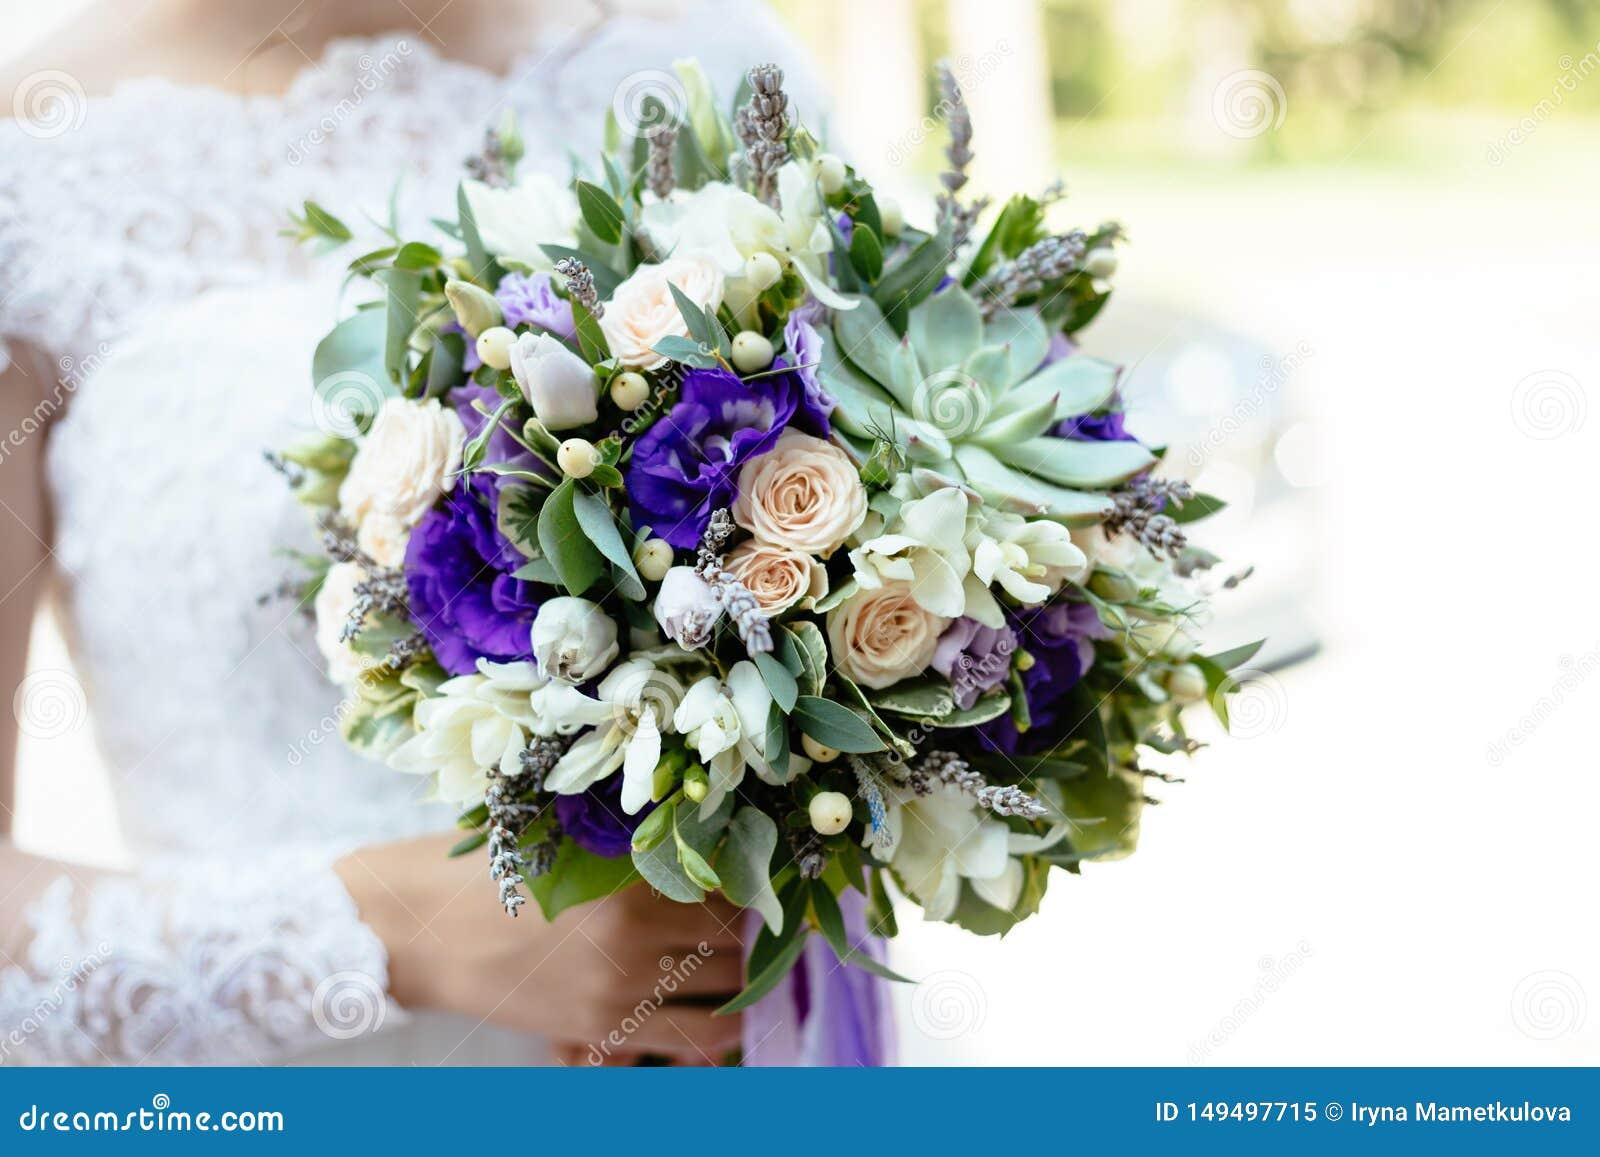 Purple Green Succulent Flower Wedding Bouquet Stock Image Image Of Close Lavander 149497715